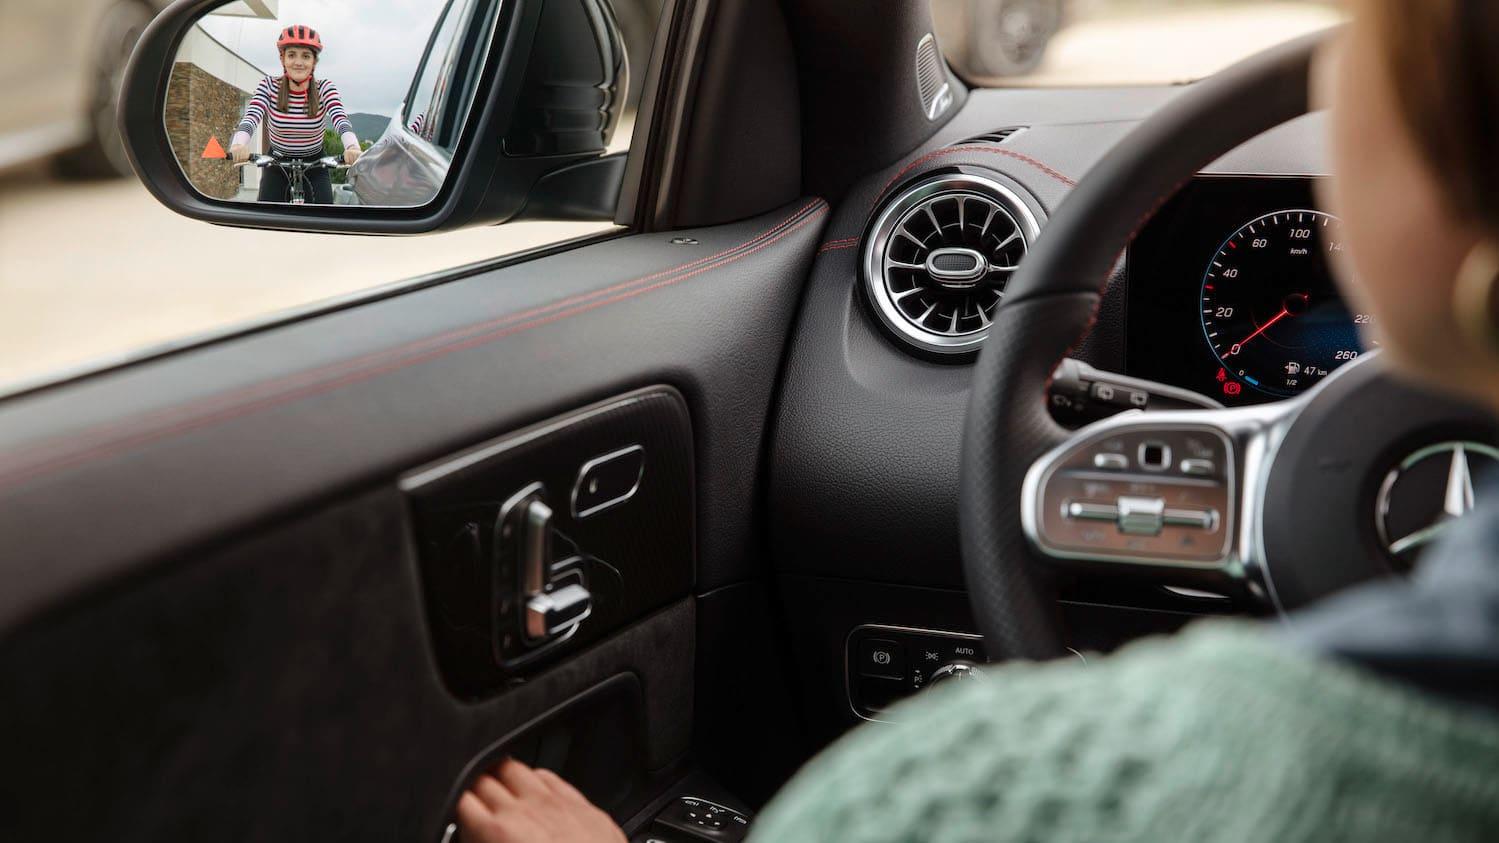 2020 Mercedes Benz Gla Interior Teased Caradvice